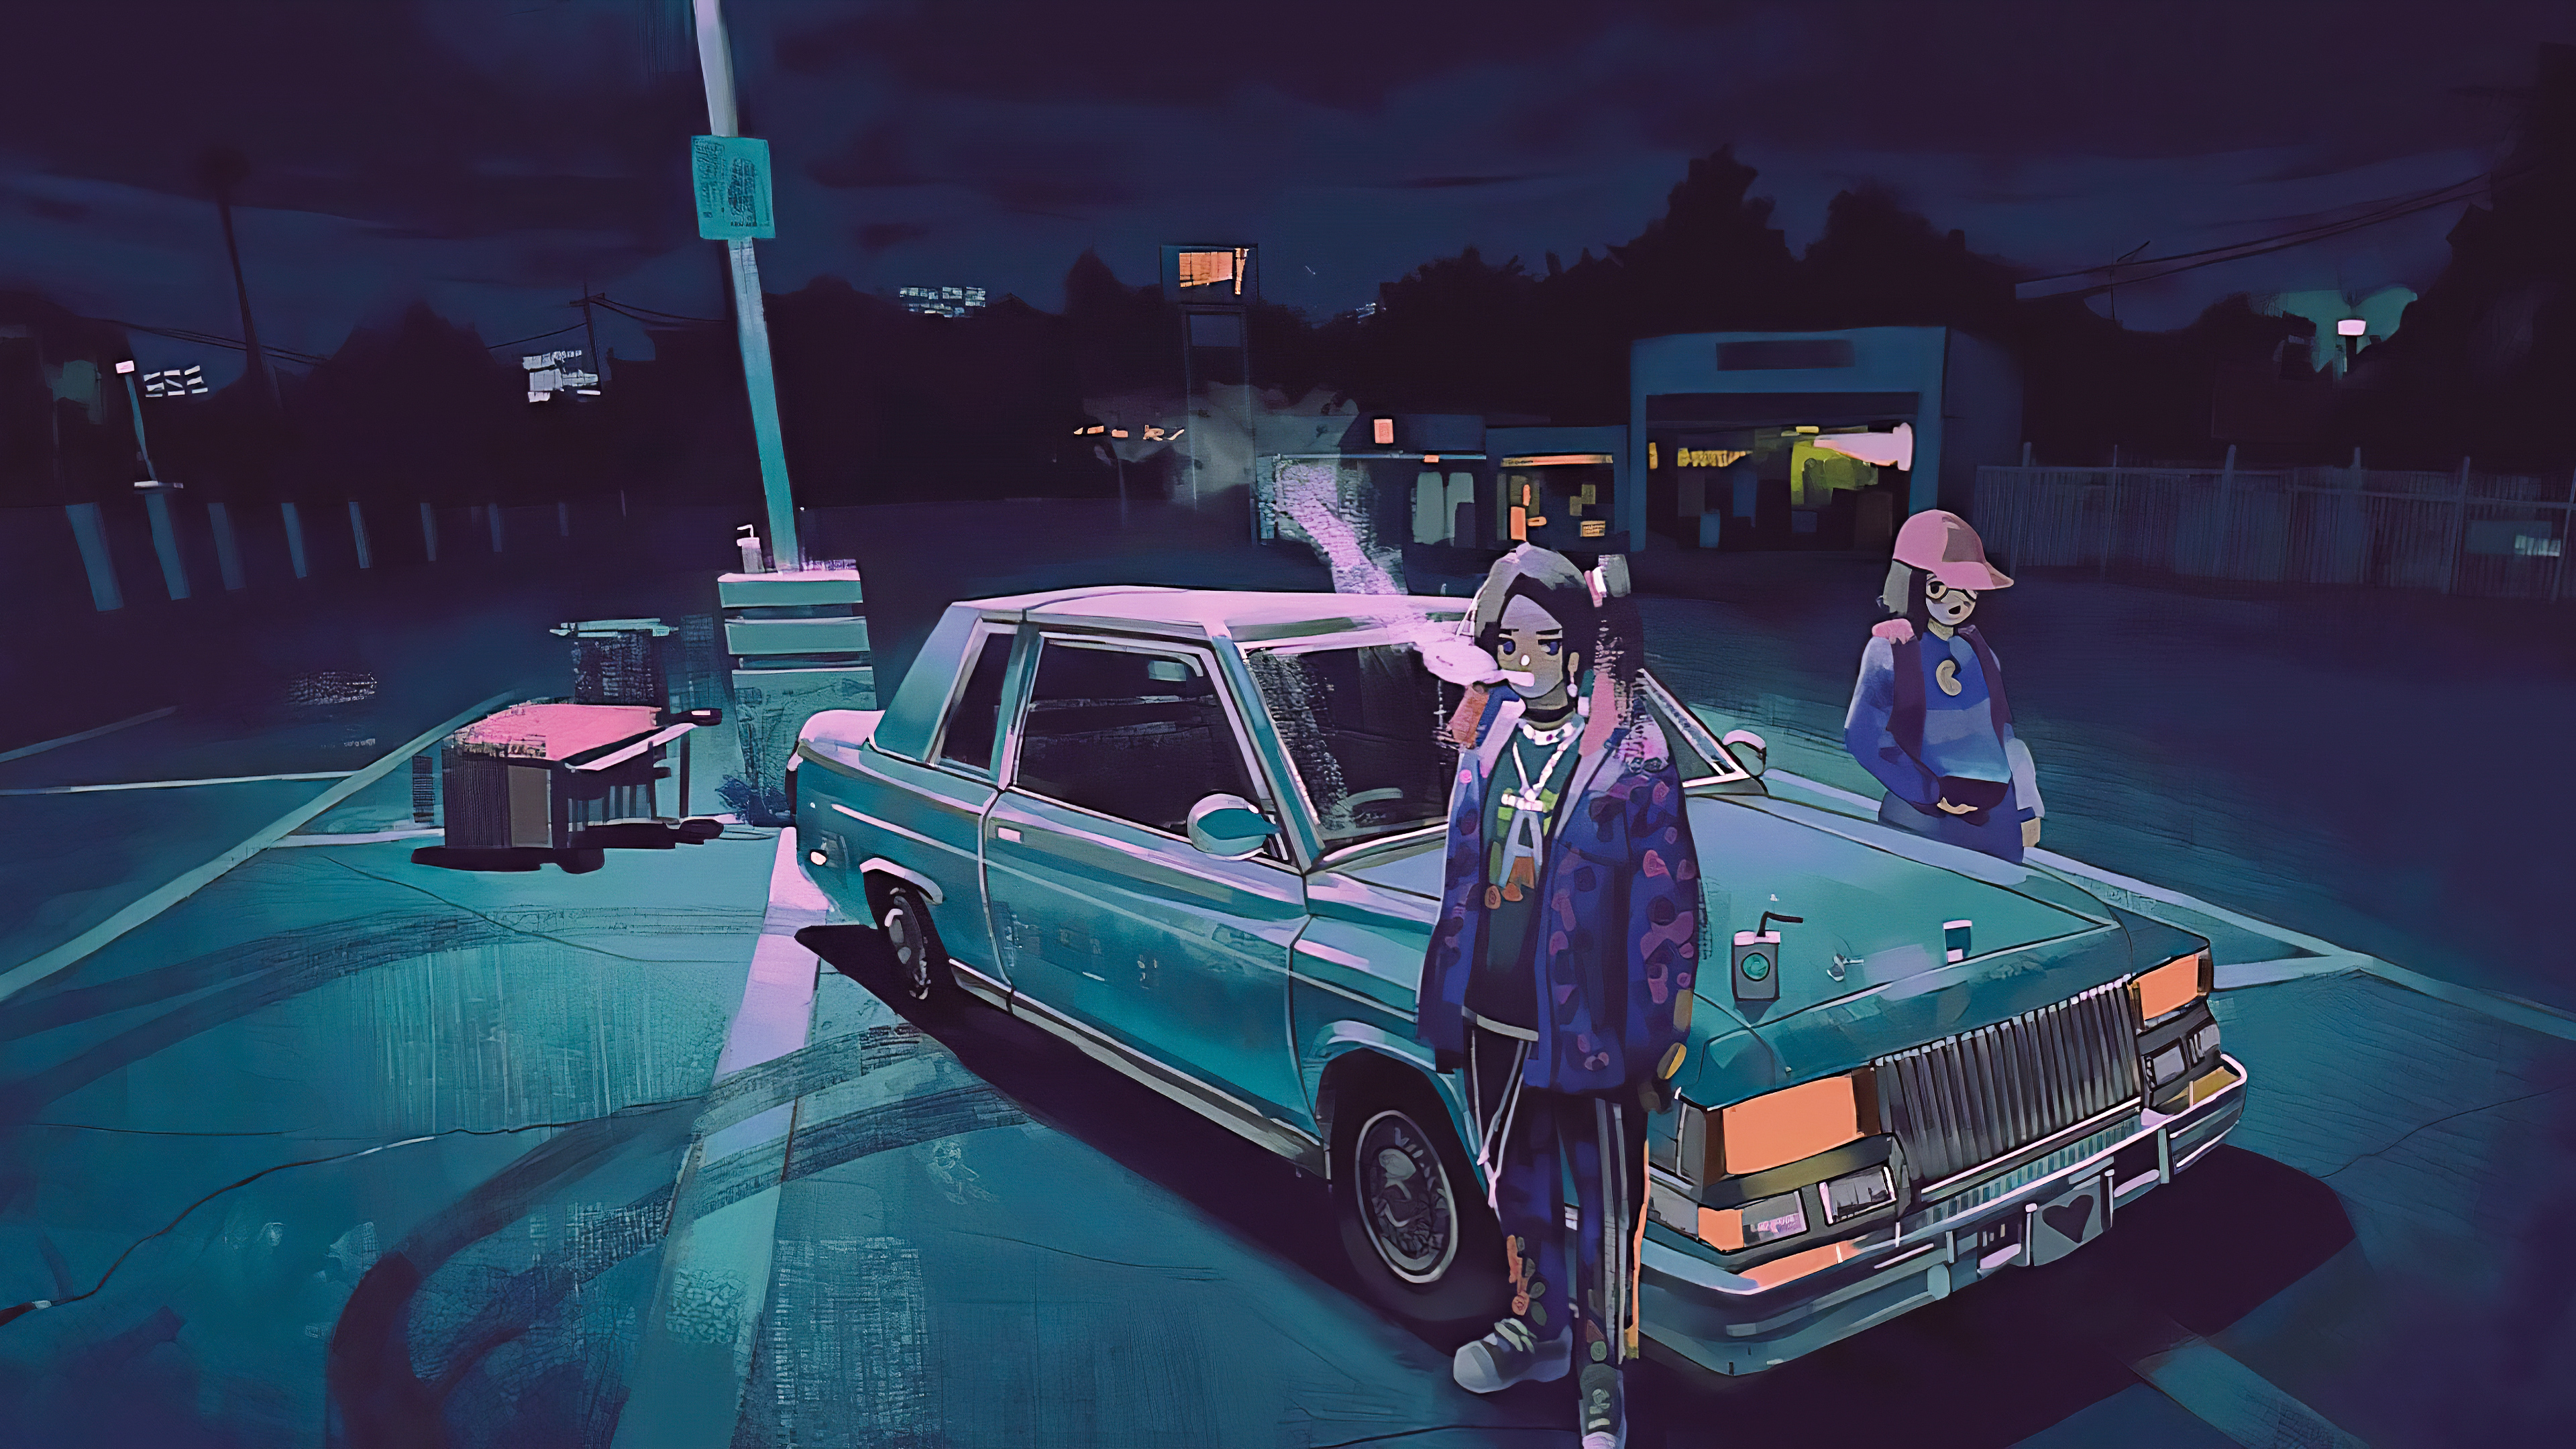 anime girl in parking lot 1578254421 - Anime Girl In Parking Lot -